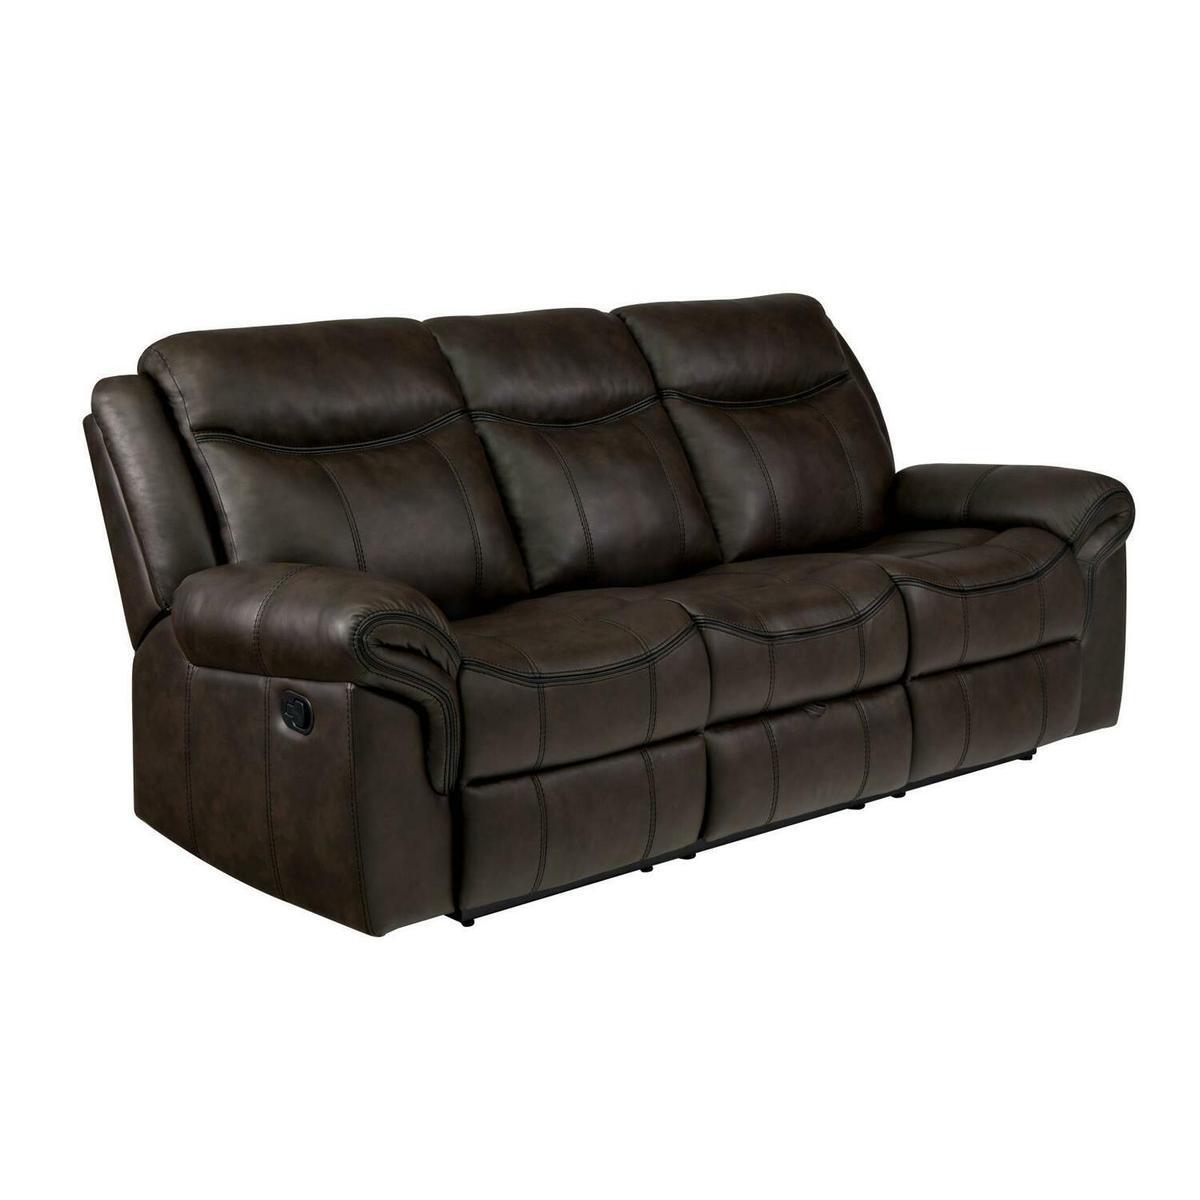 Sawyer Transitional Brown Motion Sofa